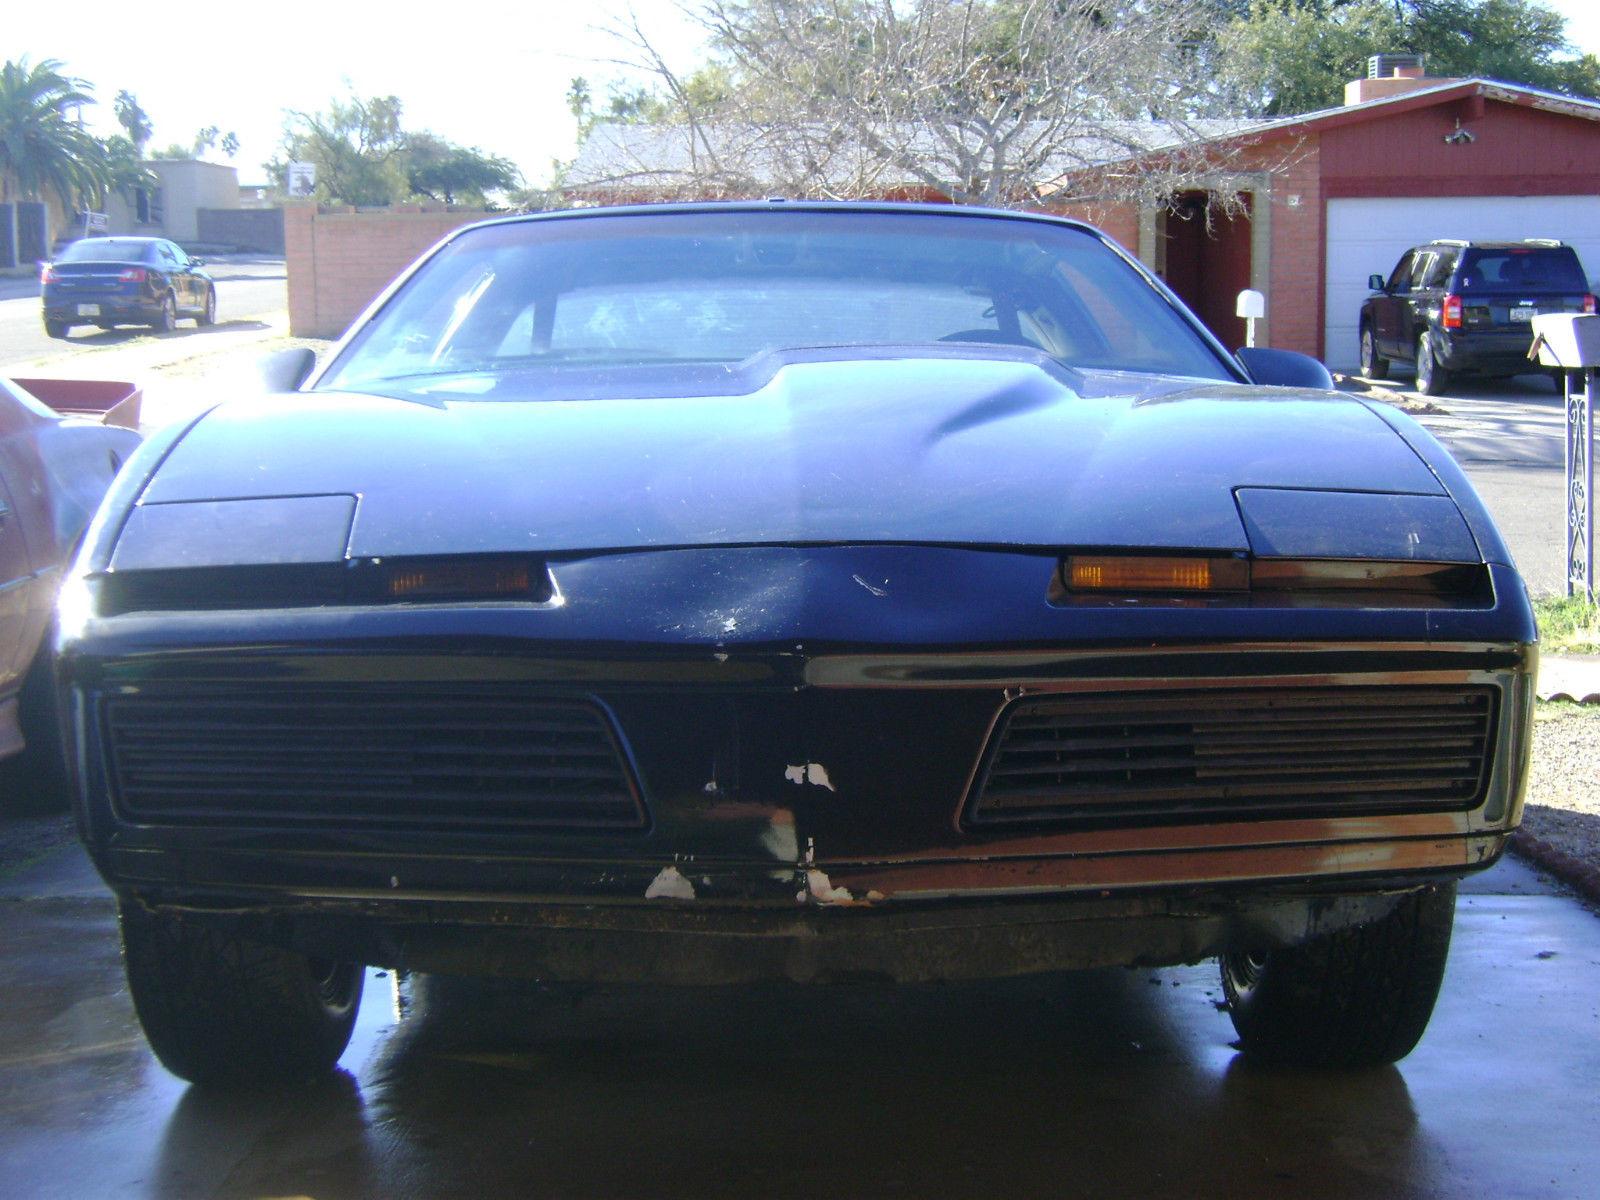 1982 Pontiac Firebird Trans Am Knight Rider Car For Sale